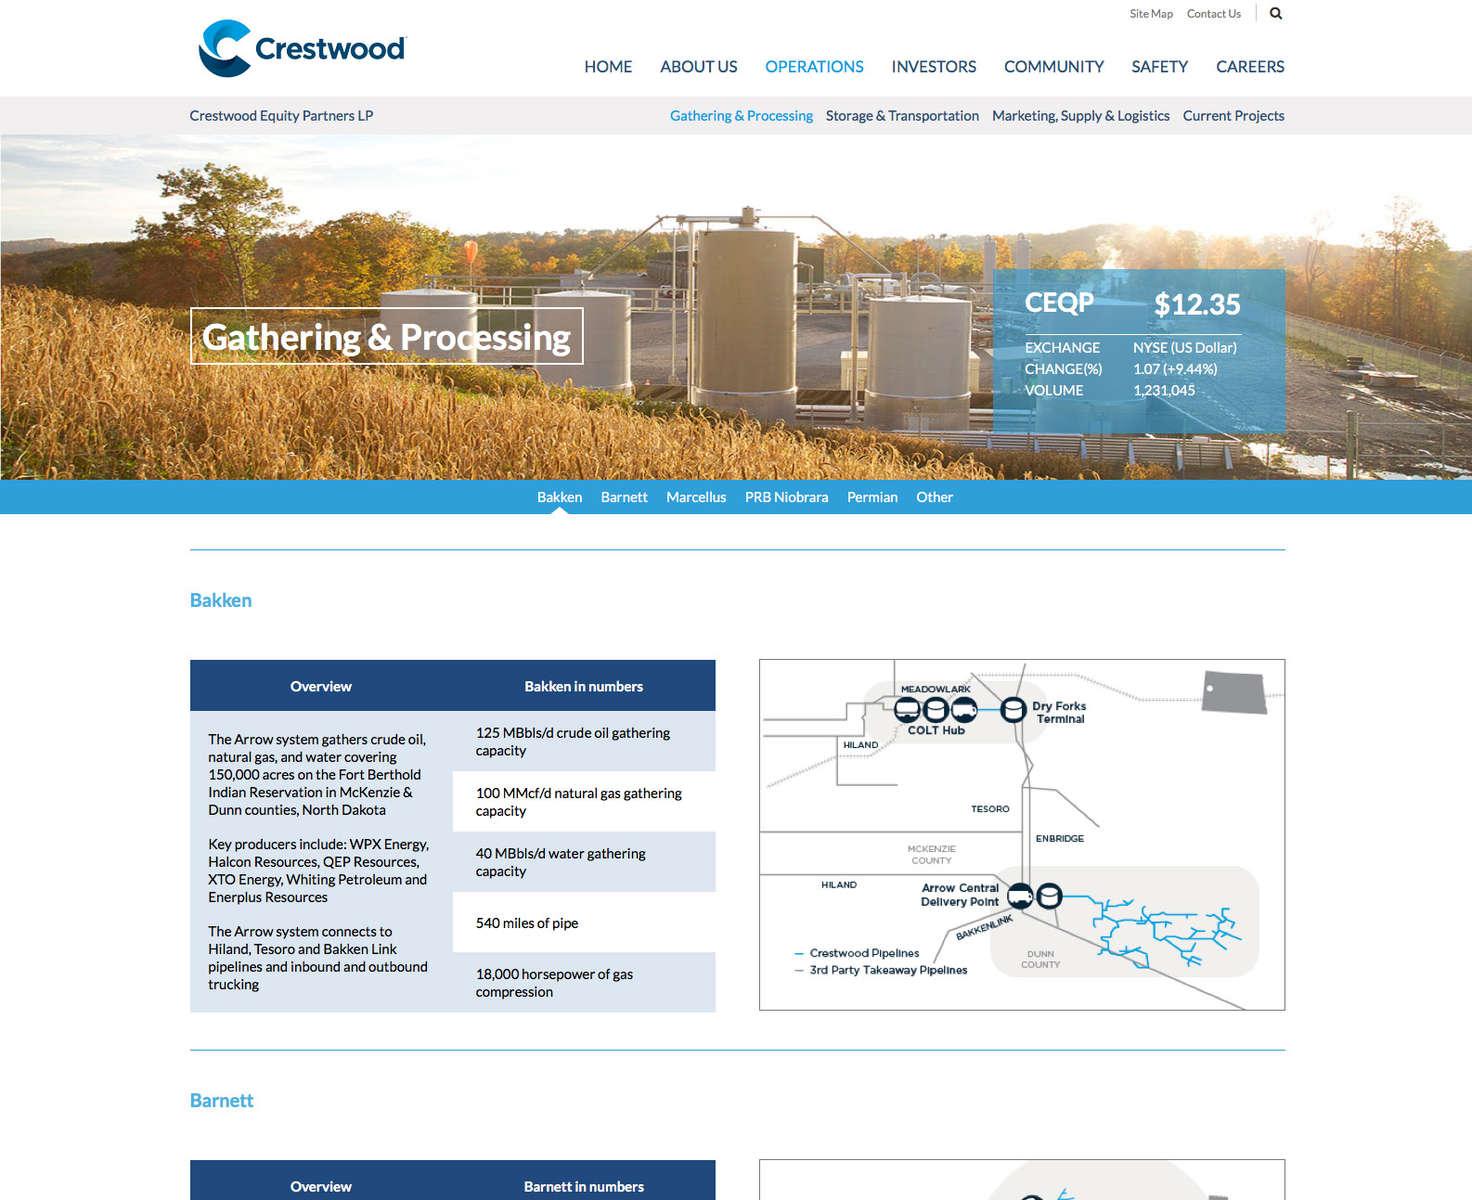 crestwood-2